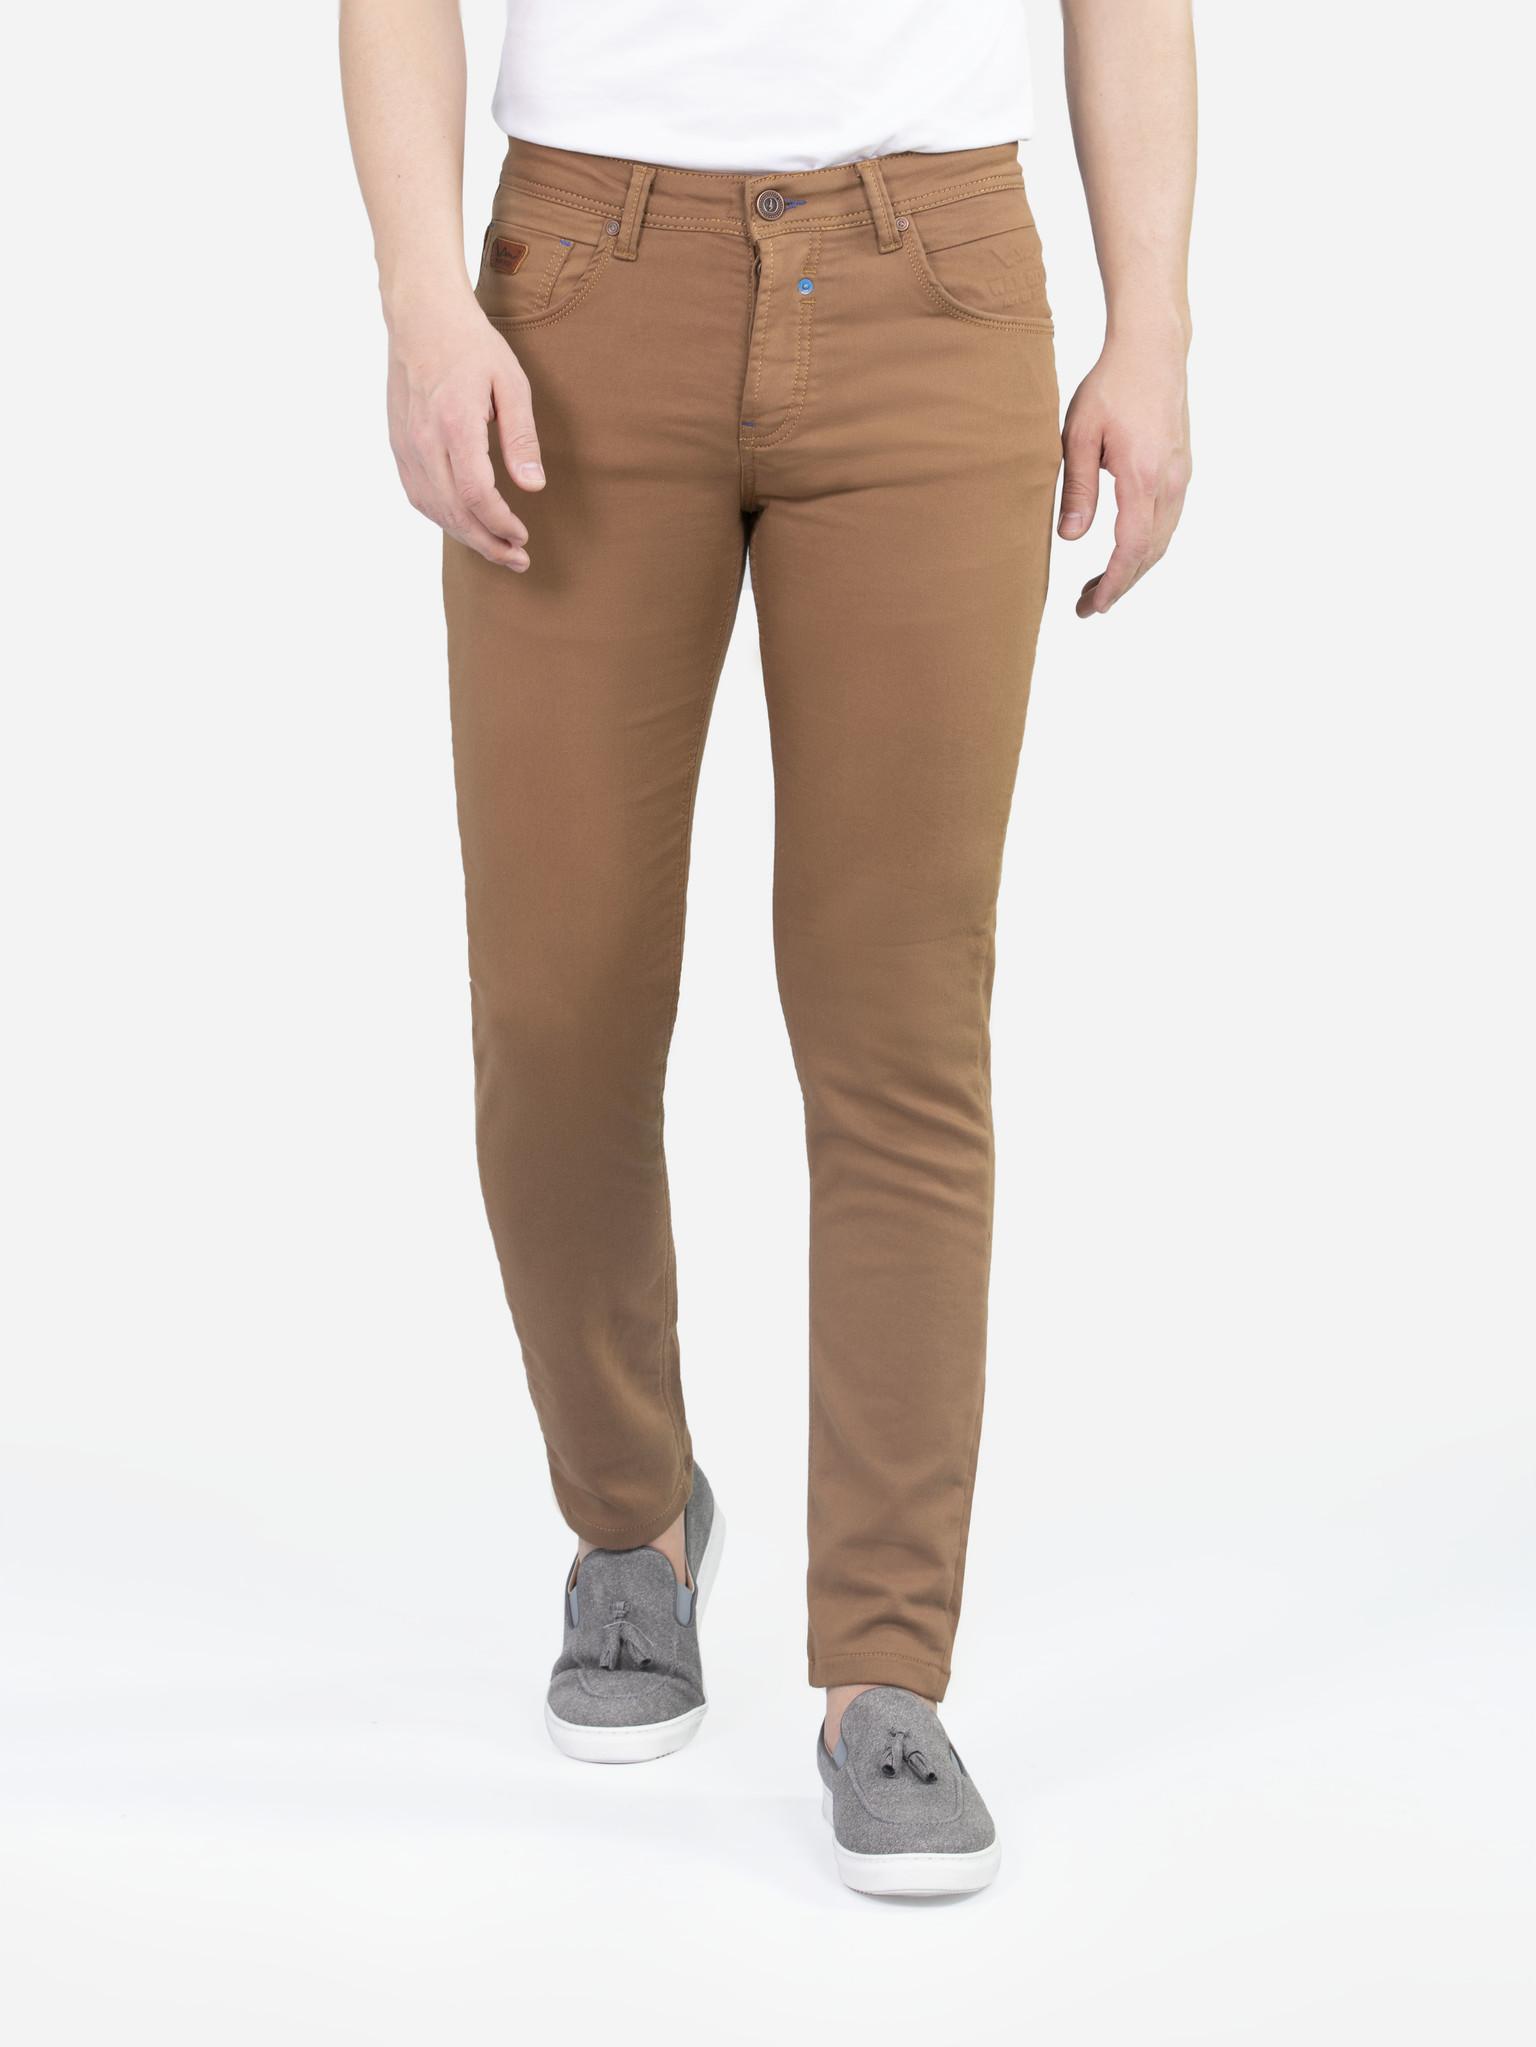 Wam Denim Jeans  Maat: 33/30